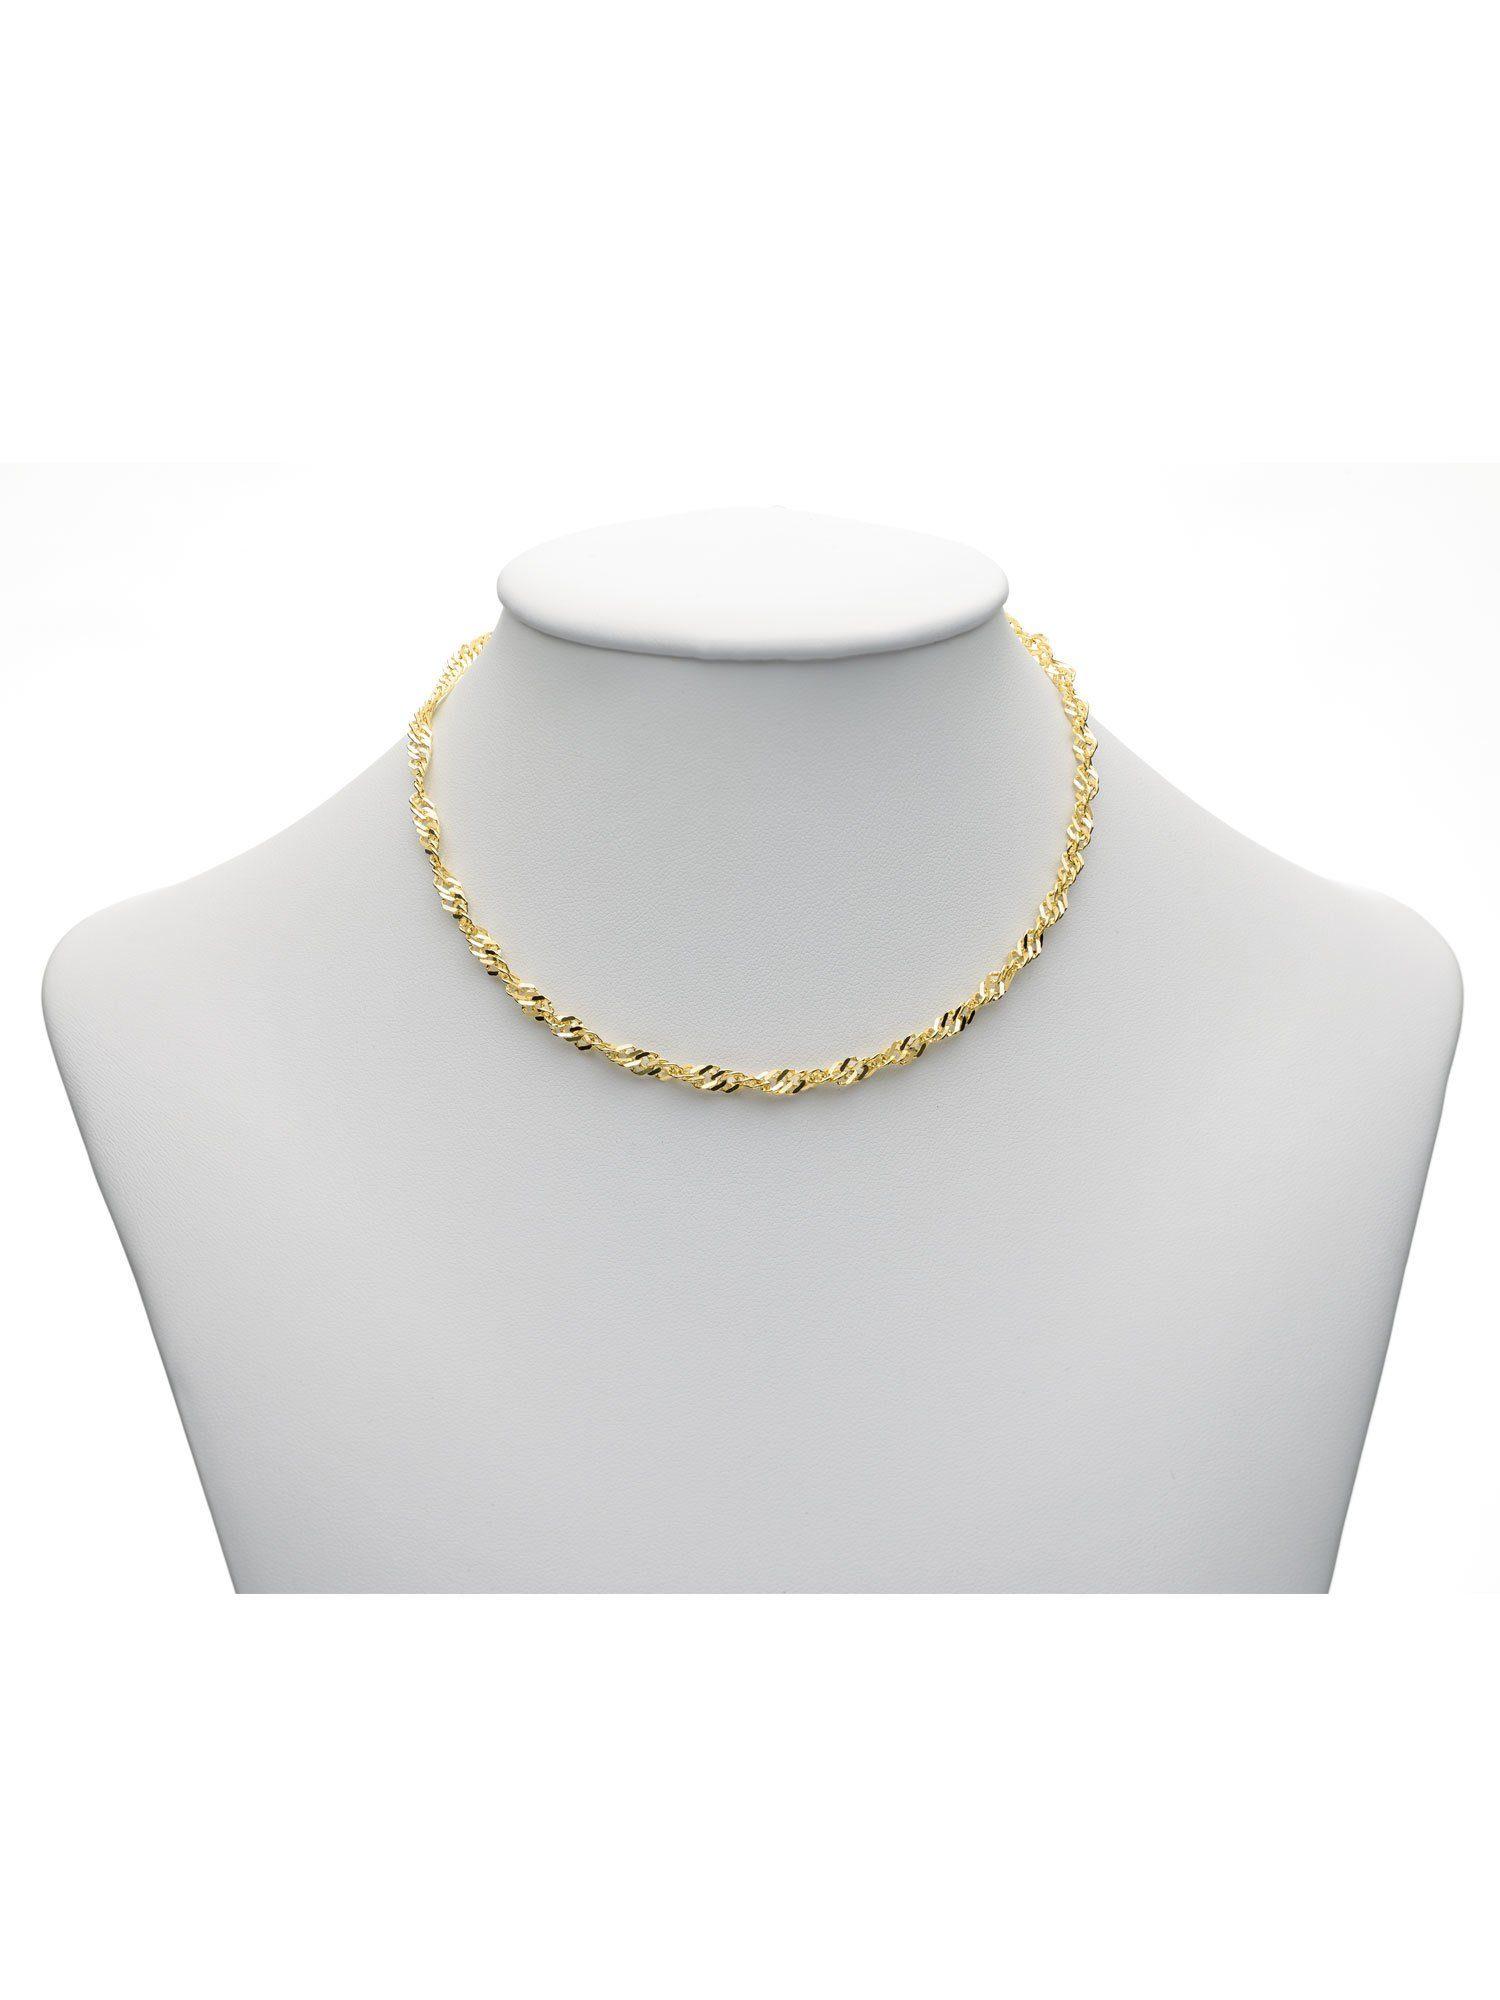 Adelia´s Goldarmband »Gold Armbänder« 8 k 333 Gelbgold Singapur Kette